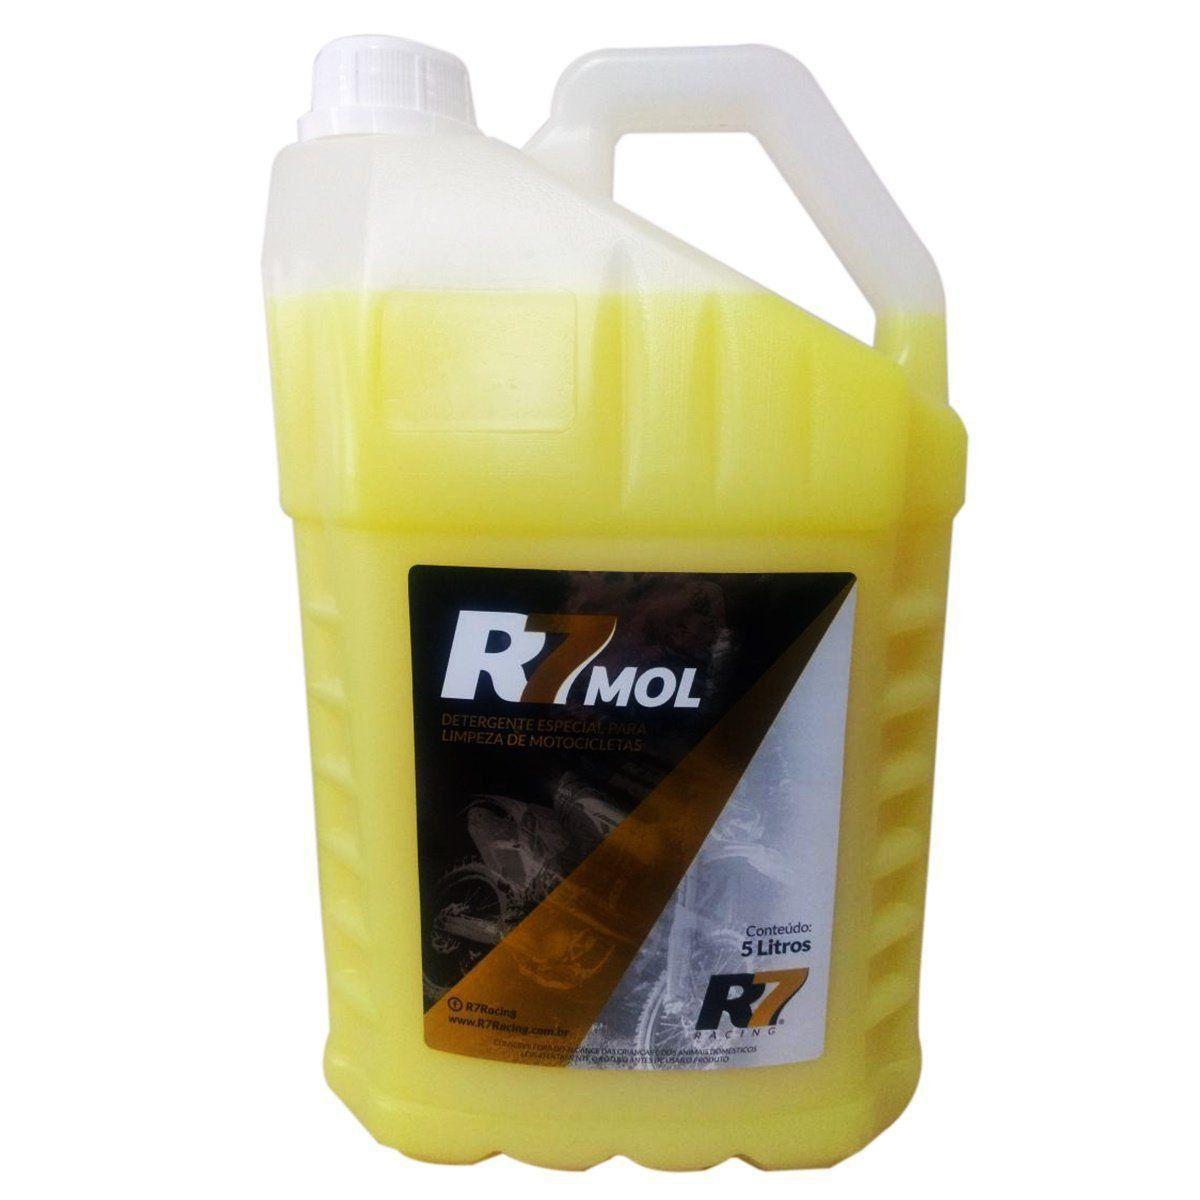 Shampoo Detergente R7 Det Mol Limpeza Motos Off Road